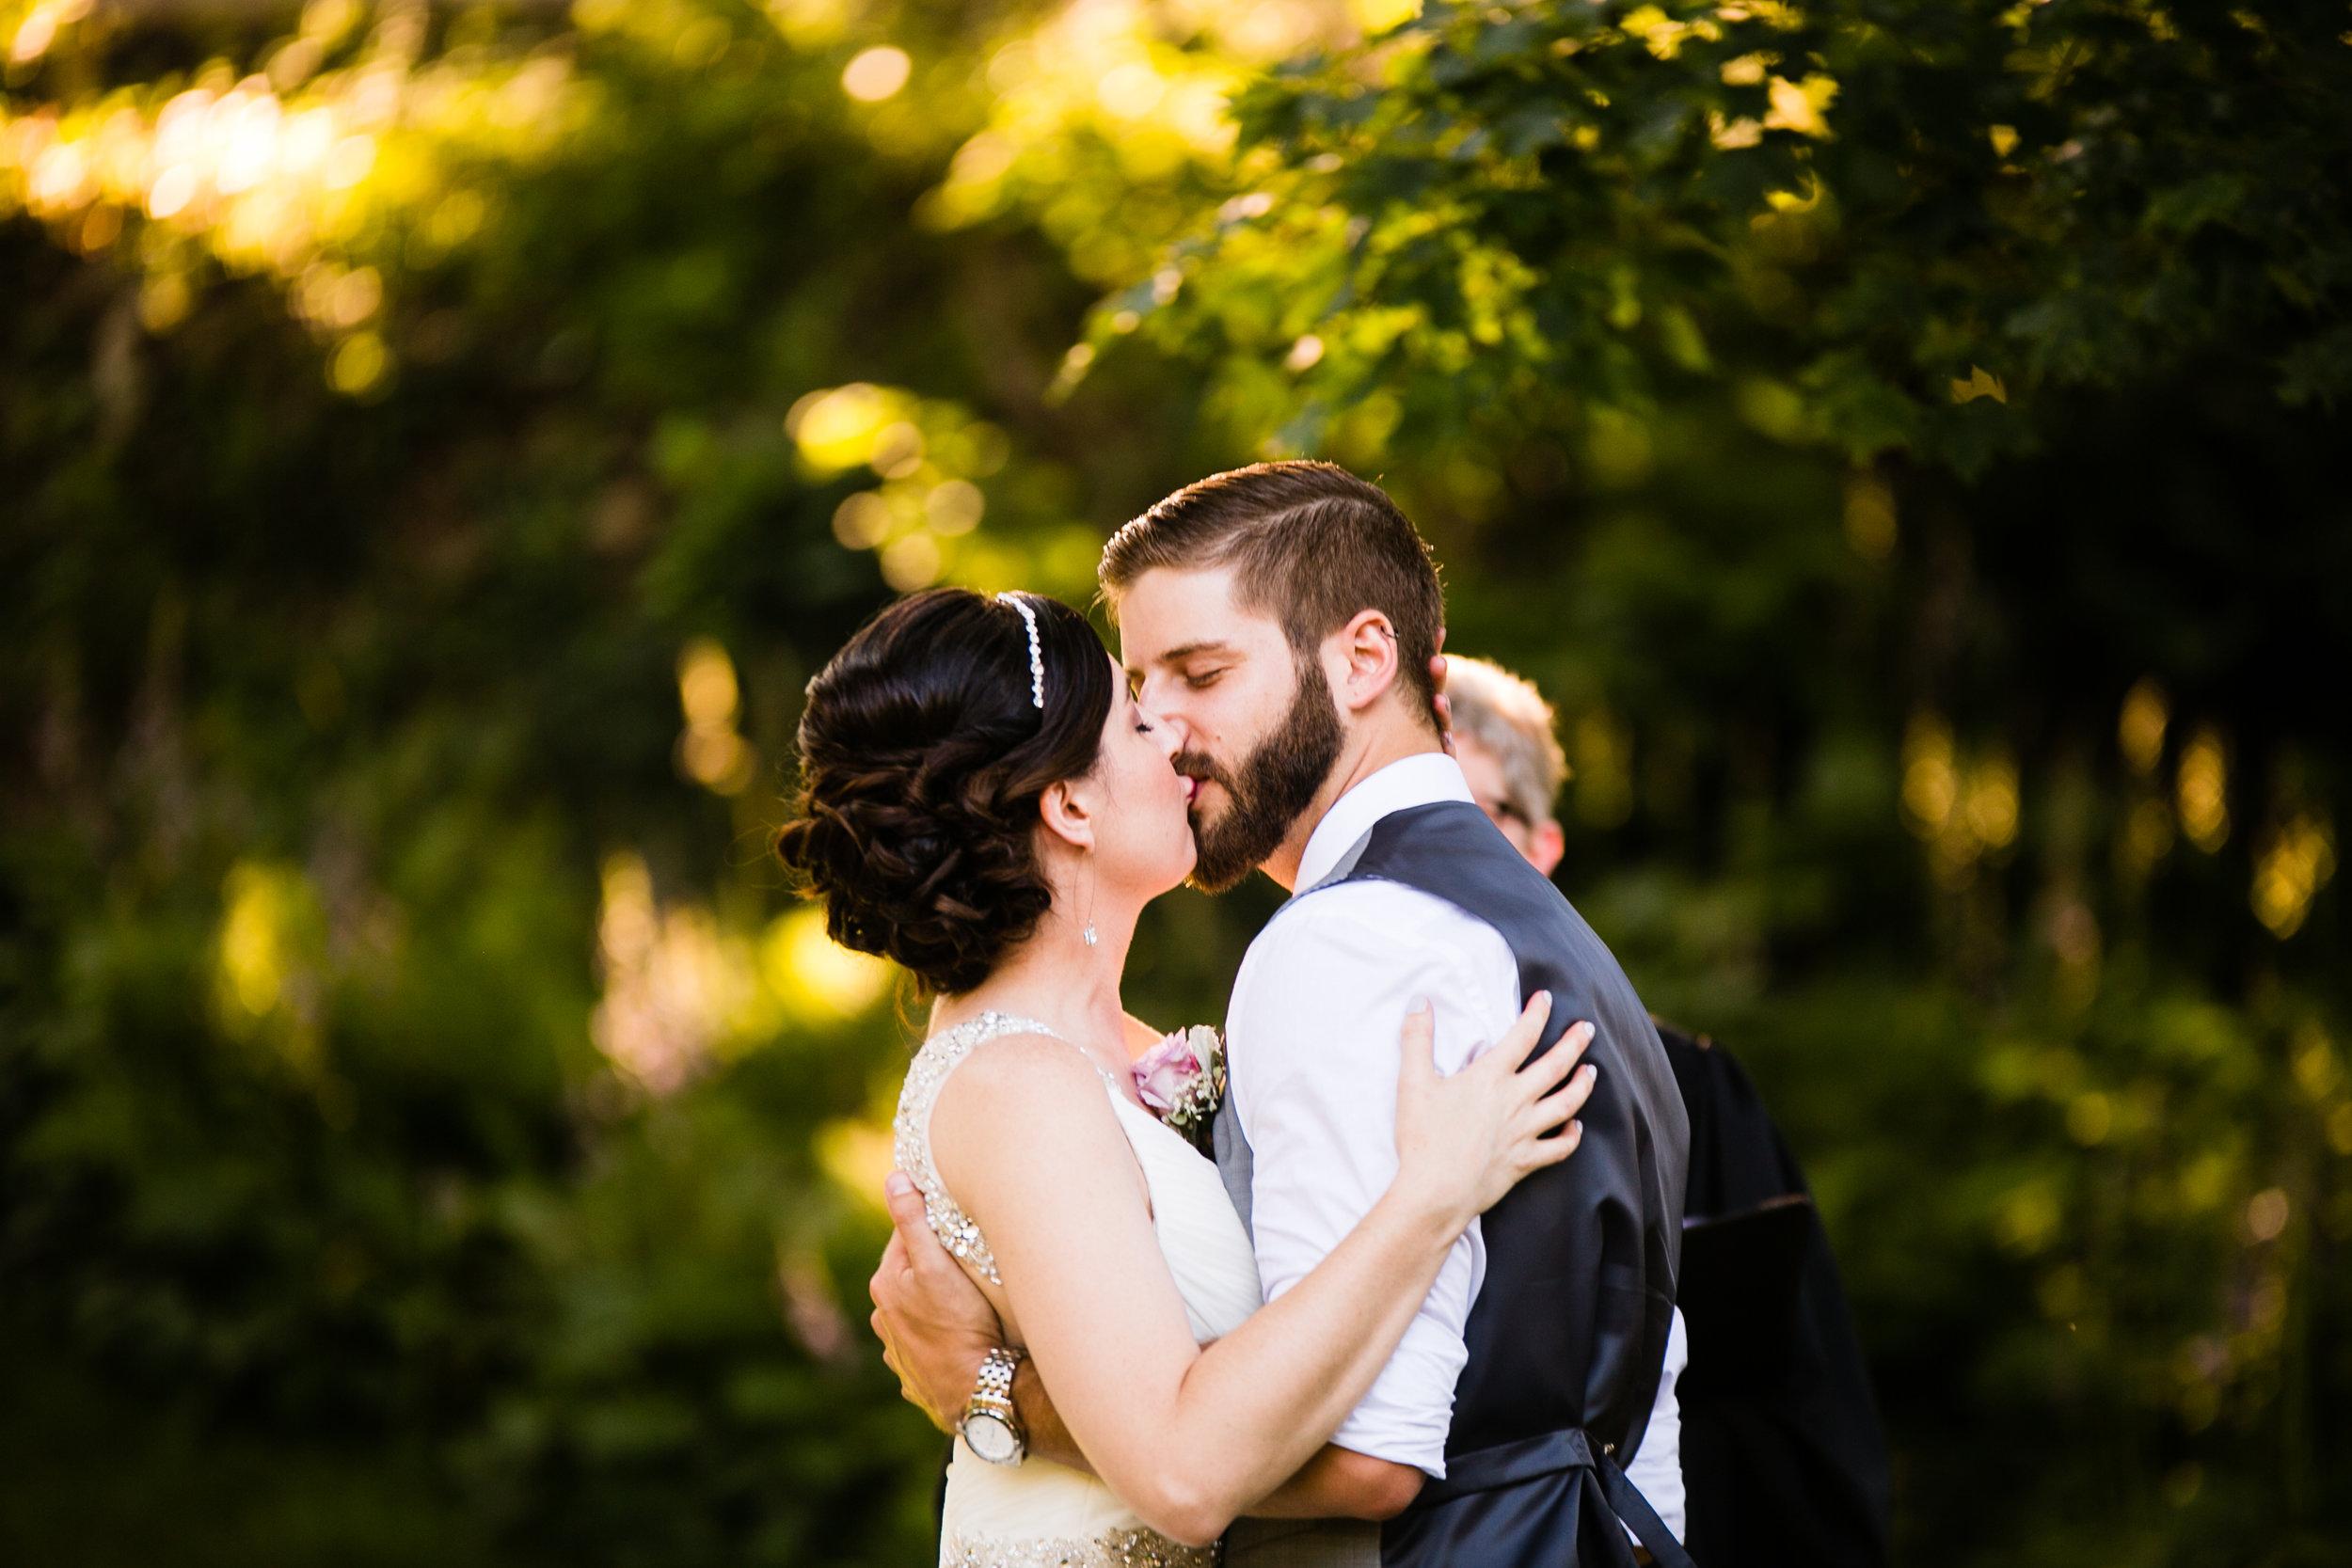 TYLER ARBORETUM WEDDING PHOTOGRAPHY LOVESTRUCK PICTURES-061.jpg